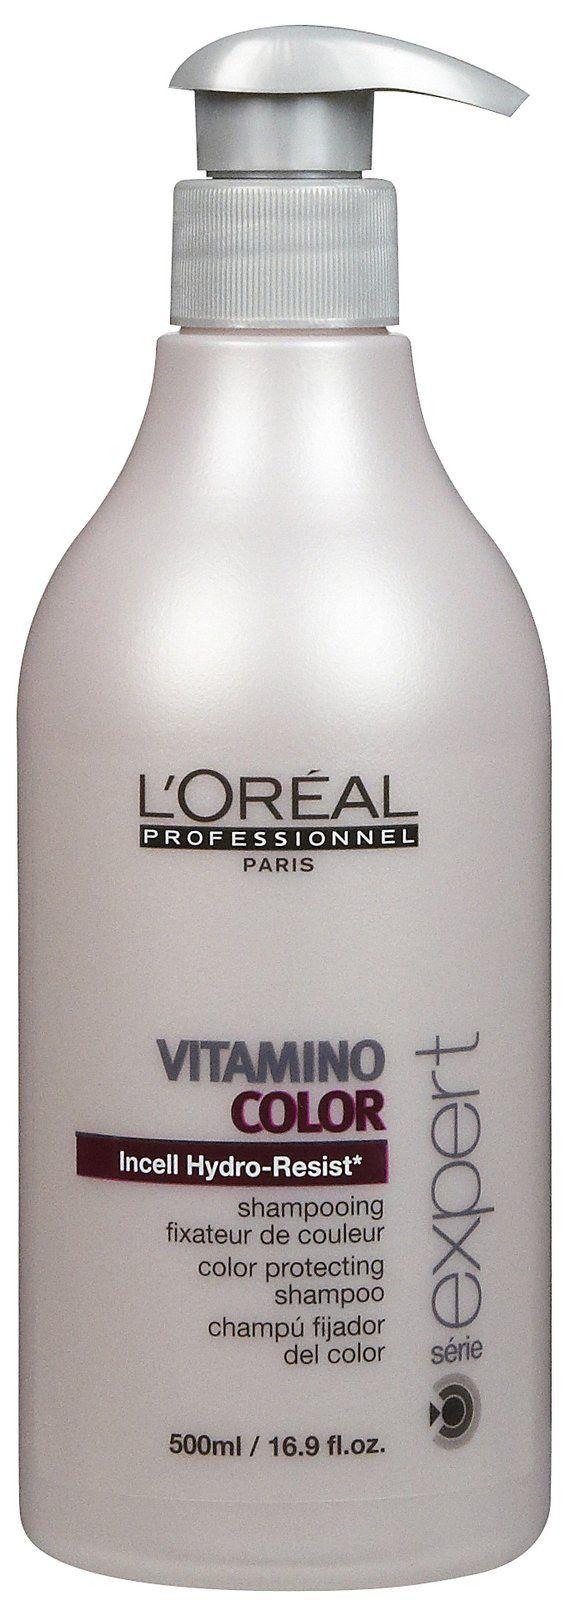 L'Oreal Professional Serie Expert Vitamino Color Shampoo